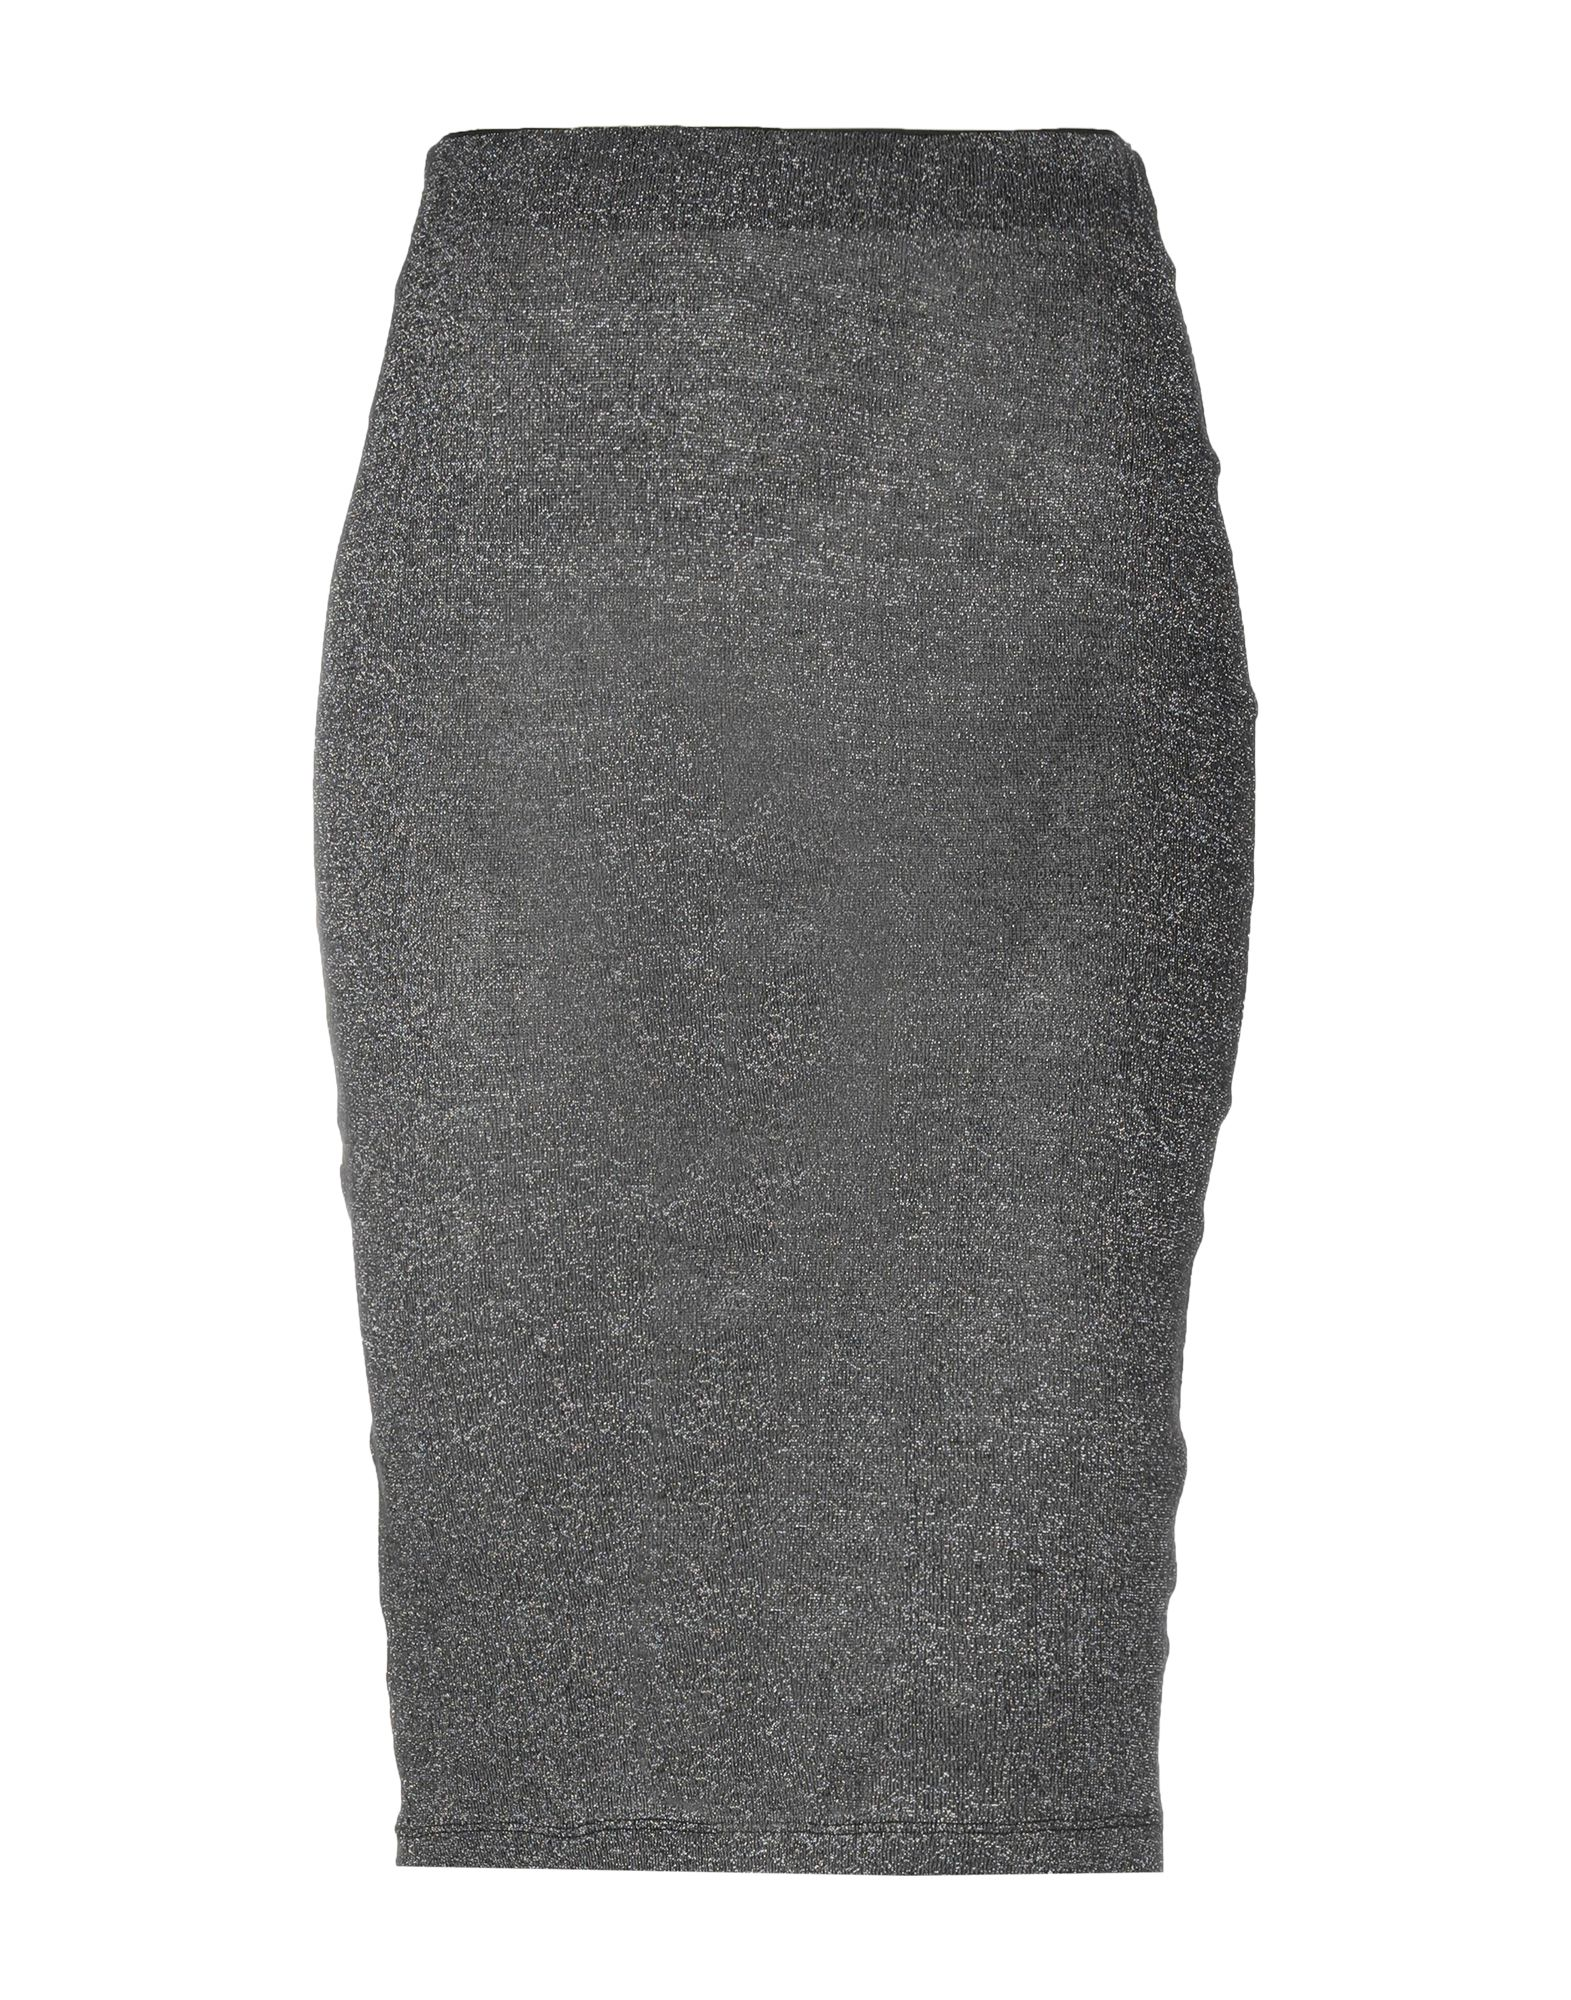 SIMONA-A Юбка длиной 3/4 p a r o s h юбка длиной 3 4